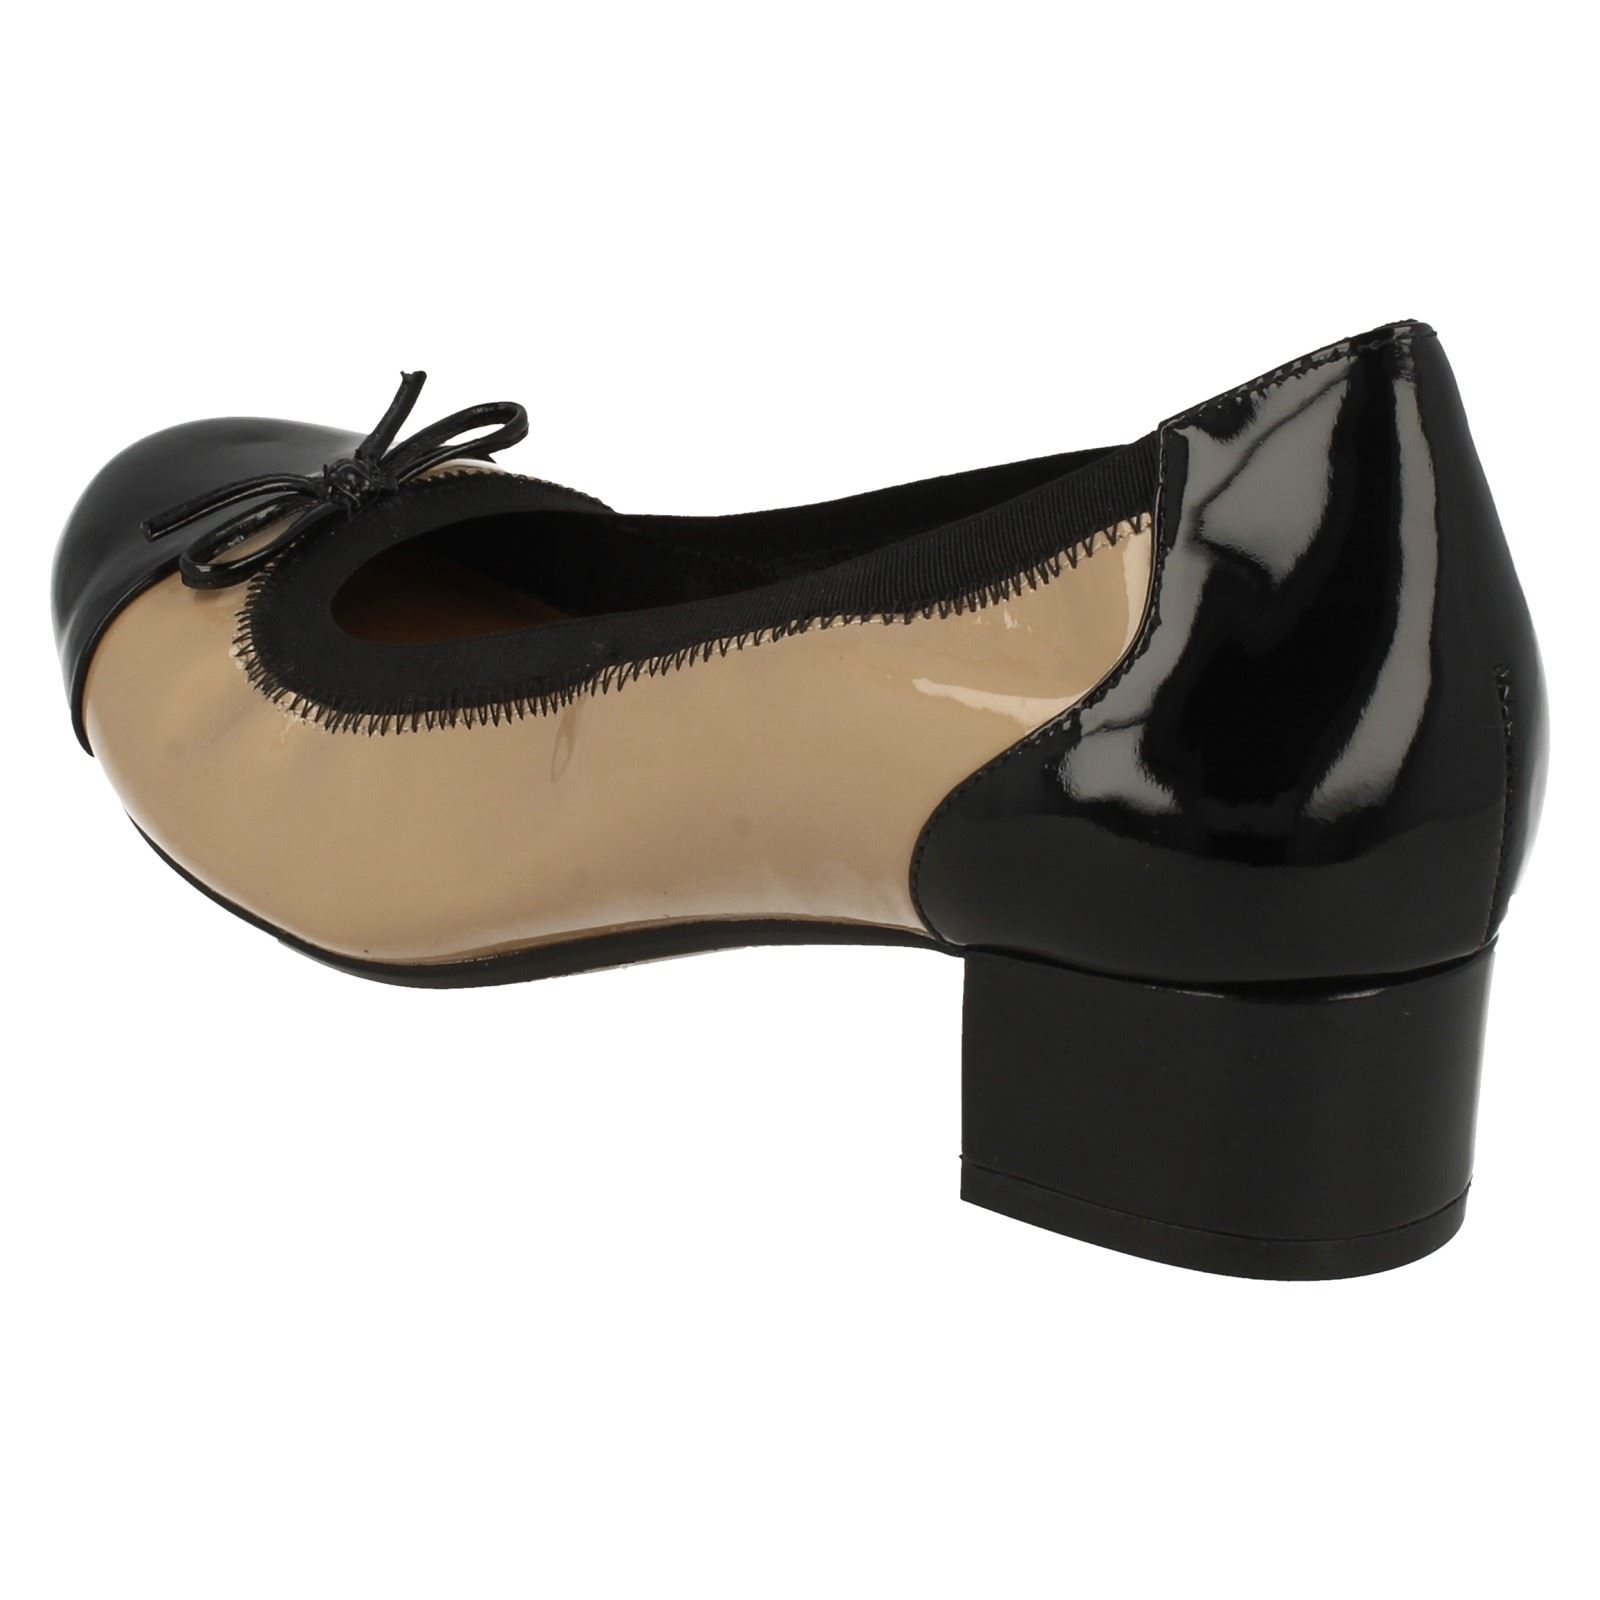 Clarks moda para Natural tacón bajo Zapatos Poema de Balcón mujer beige de qqrTwZxUWH